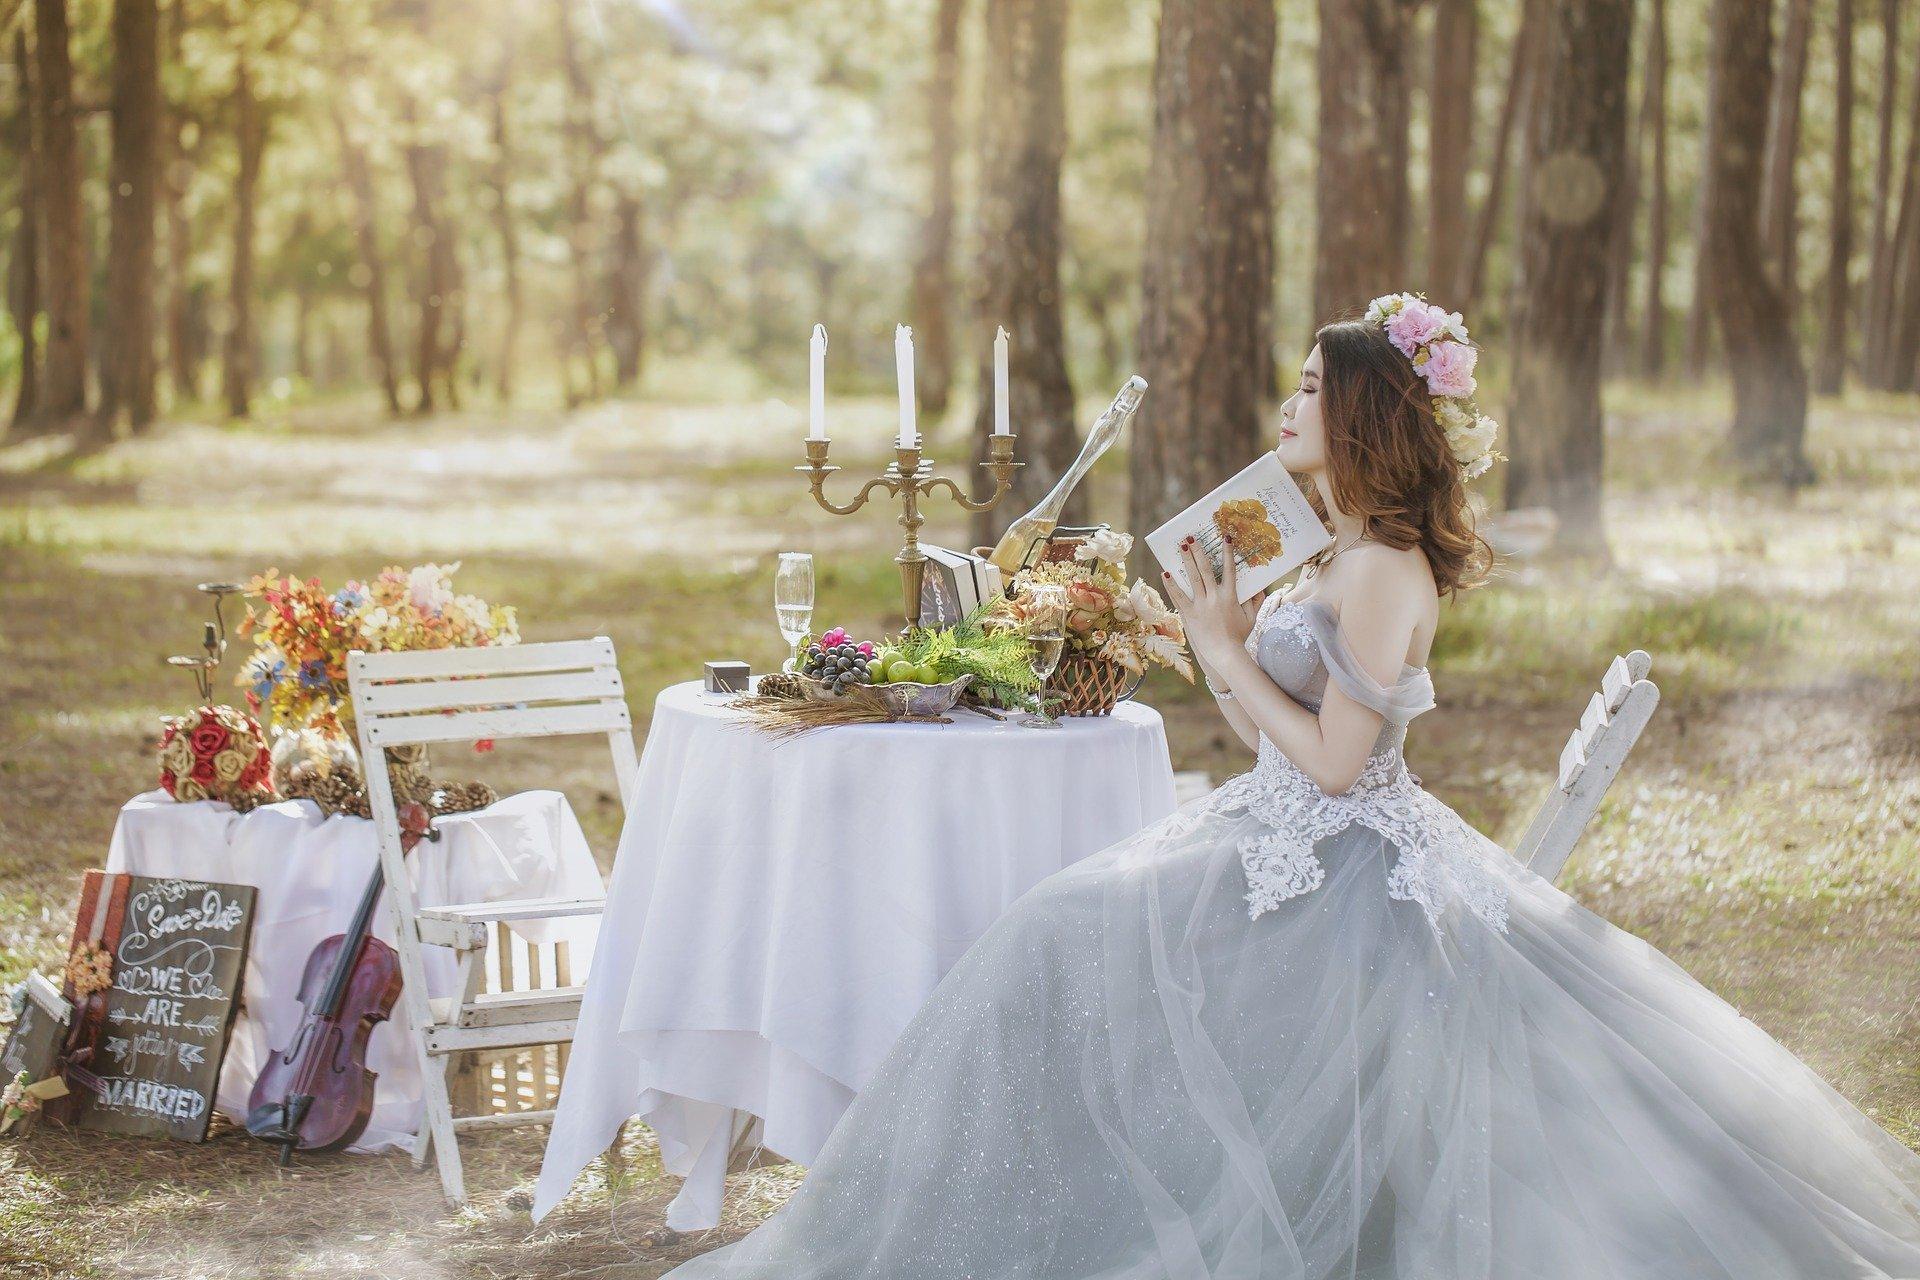 outdoor wedding dress alterations